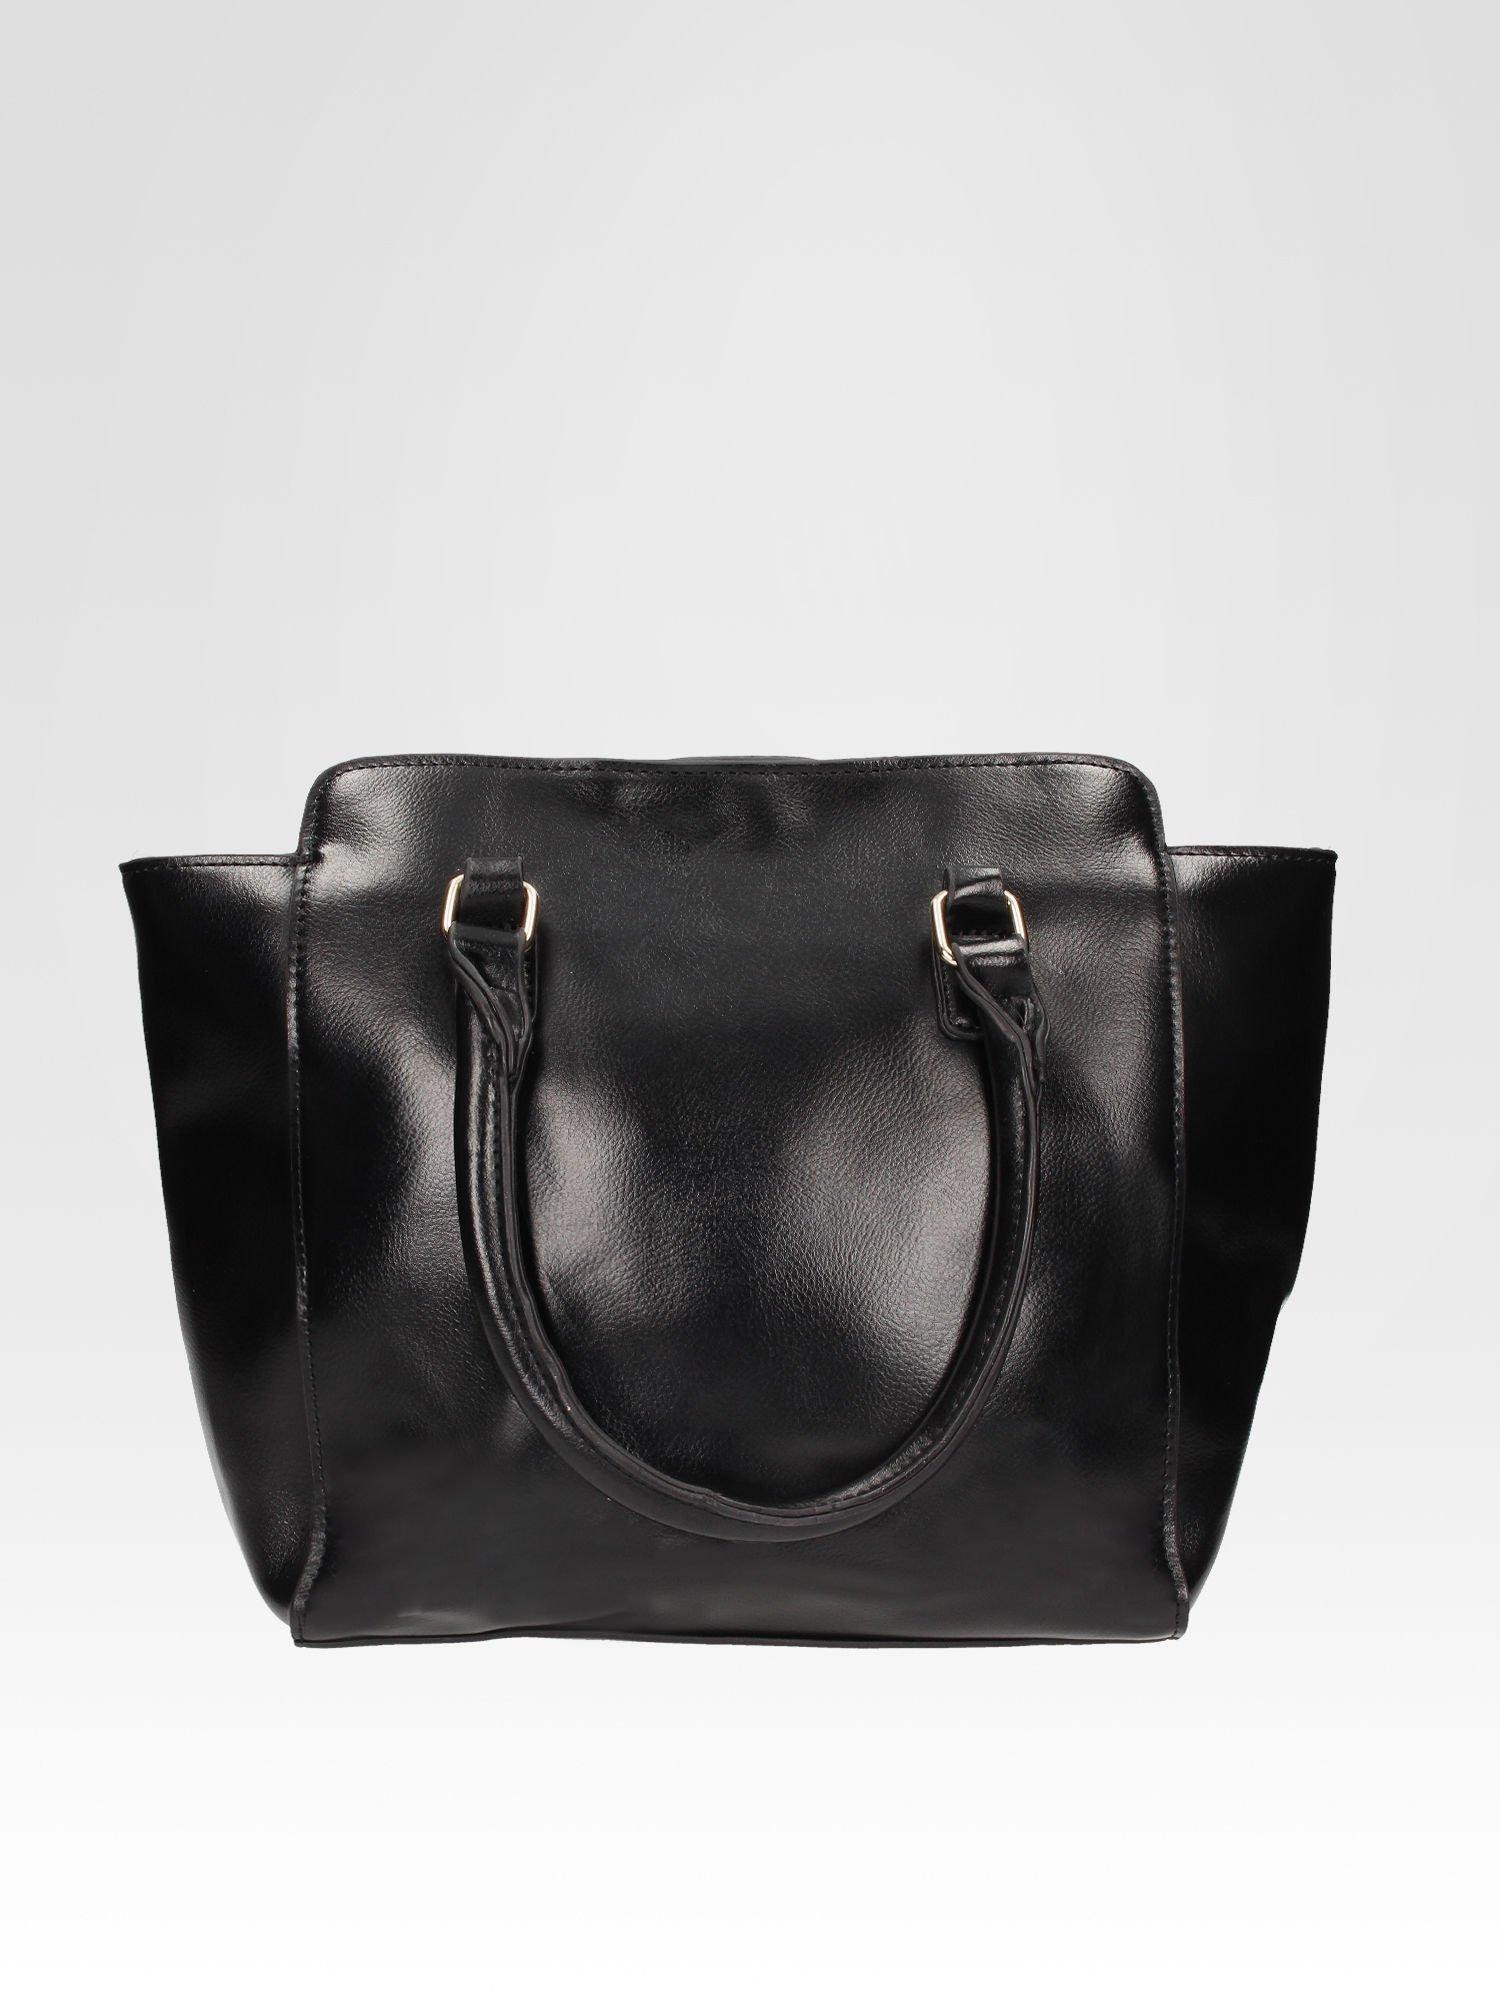 Czarna torebka na ramię z dżetami                                  zdj.                                  3